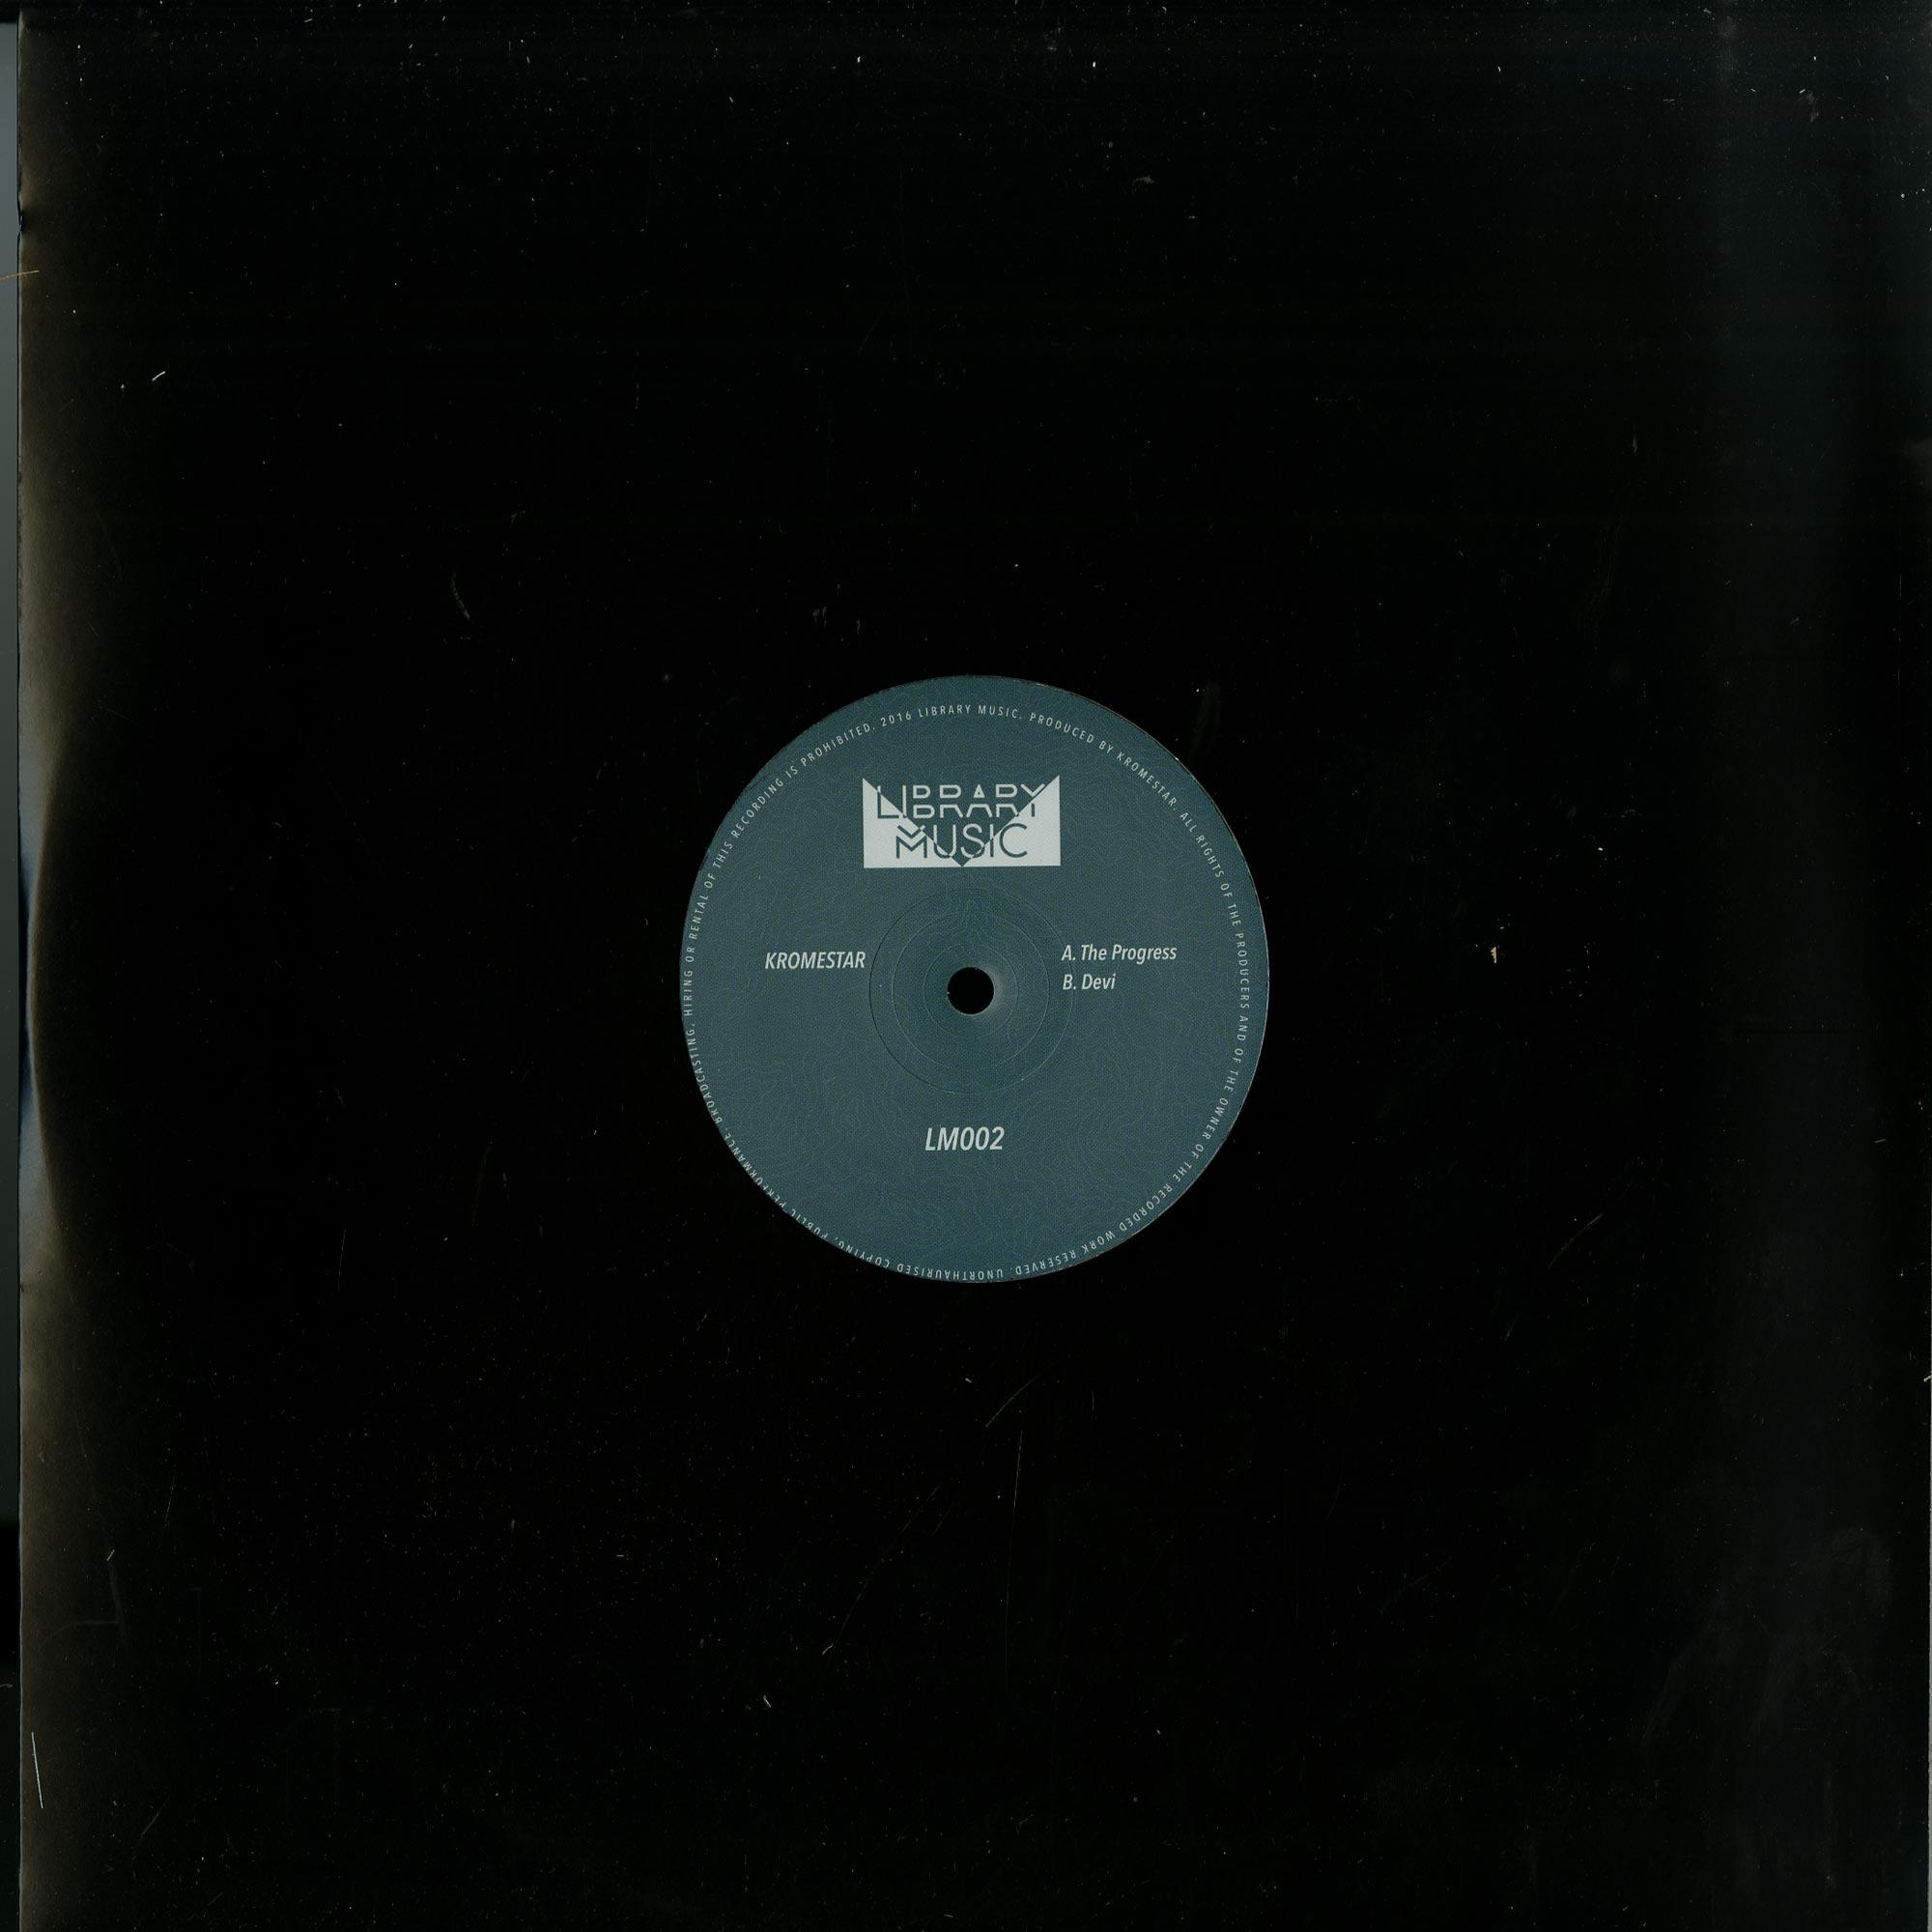 Kromestar - THE PROGRESS / DEVI